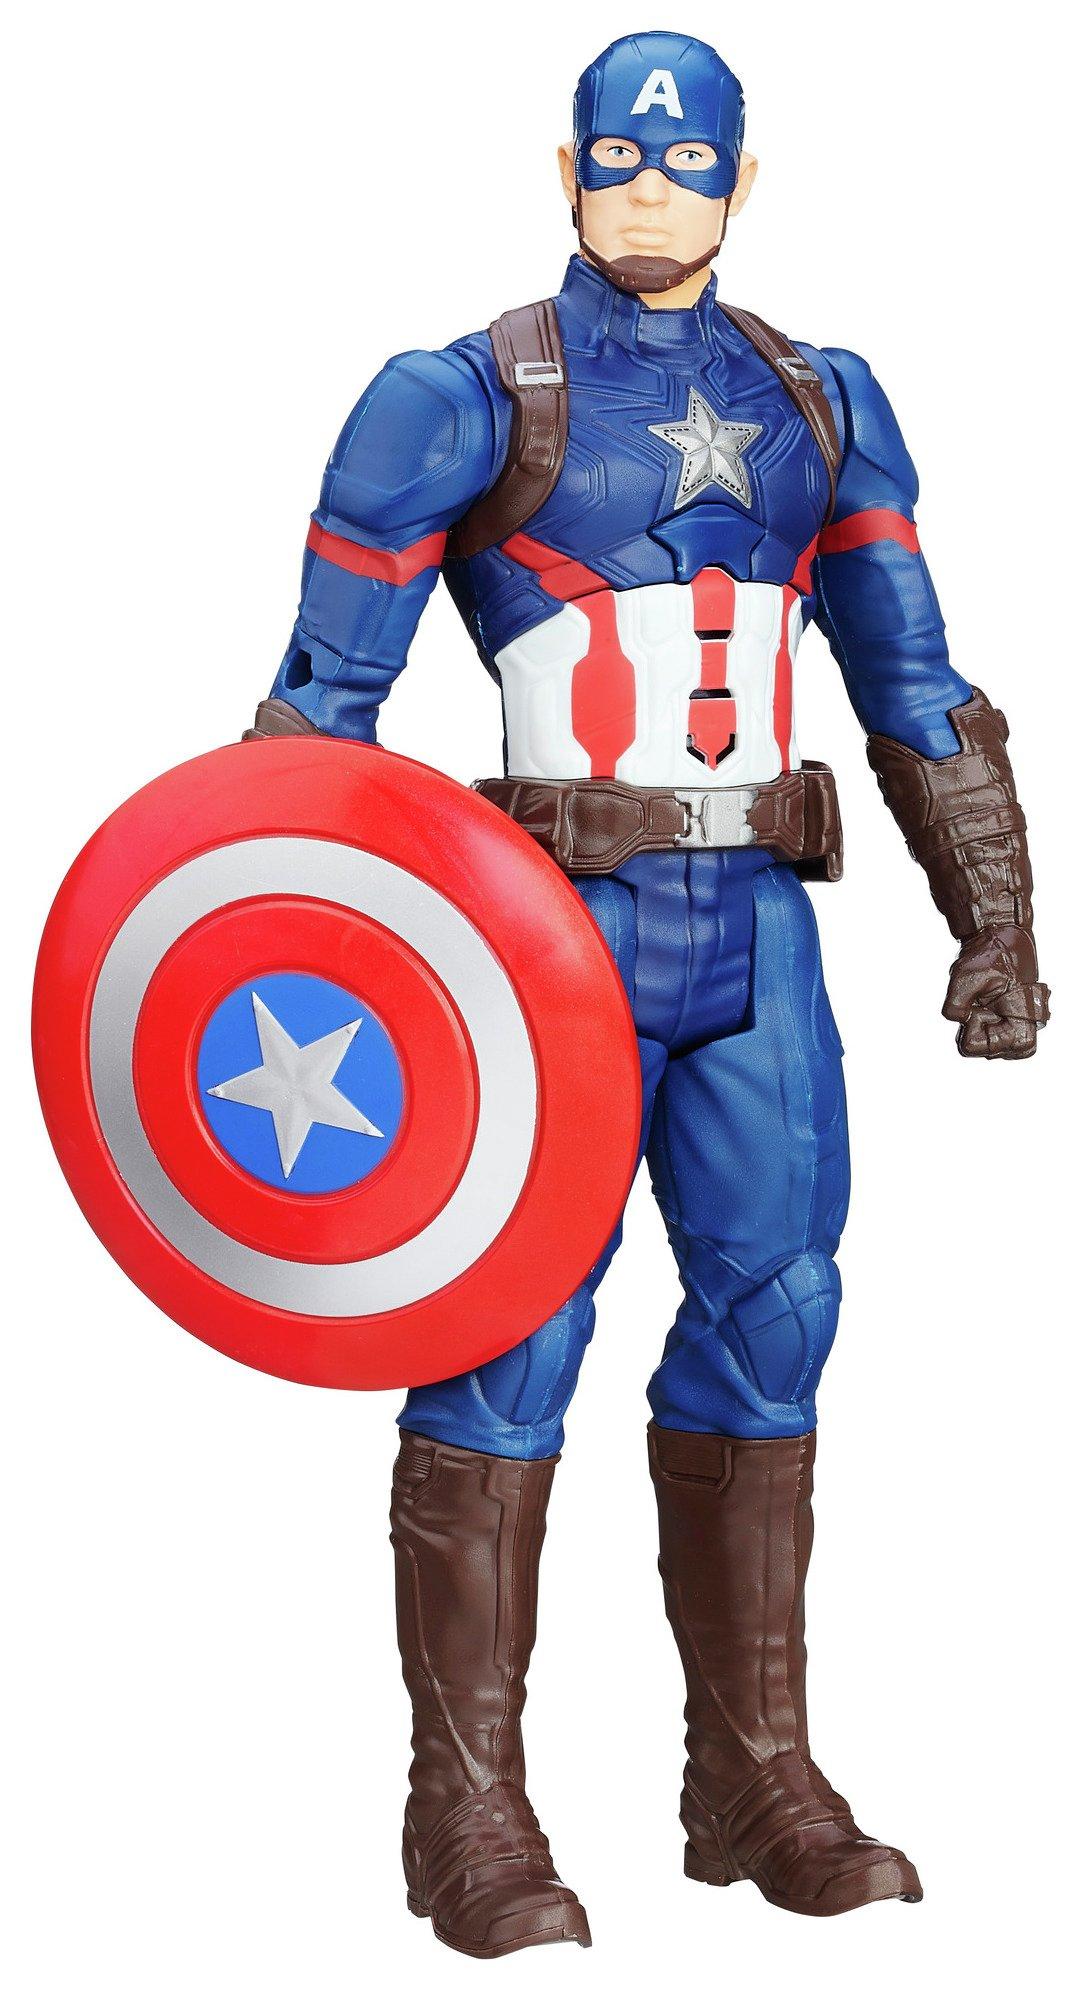 Image of Avengers Age of Ultron Titan Tech Captain America Figure